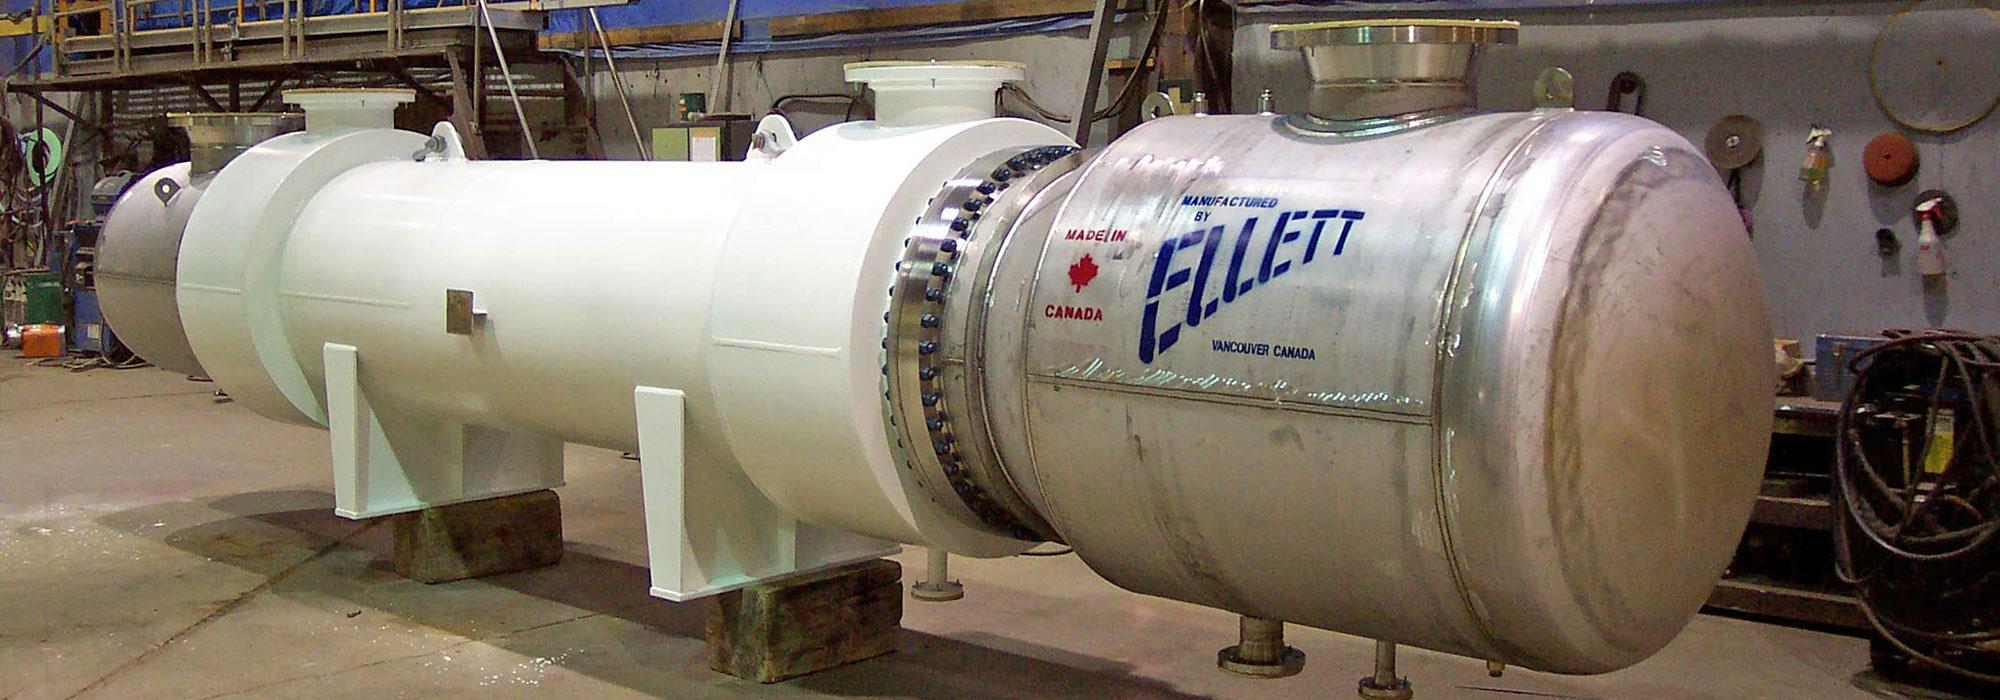 acid concentrator by Ellett Industries